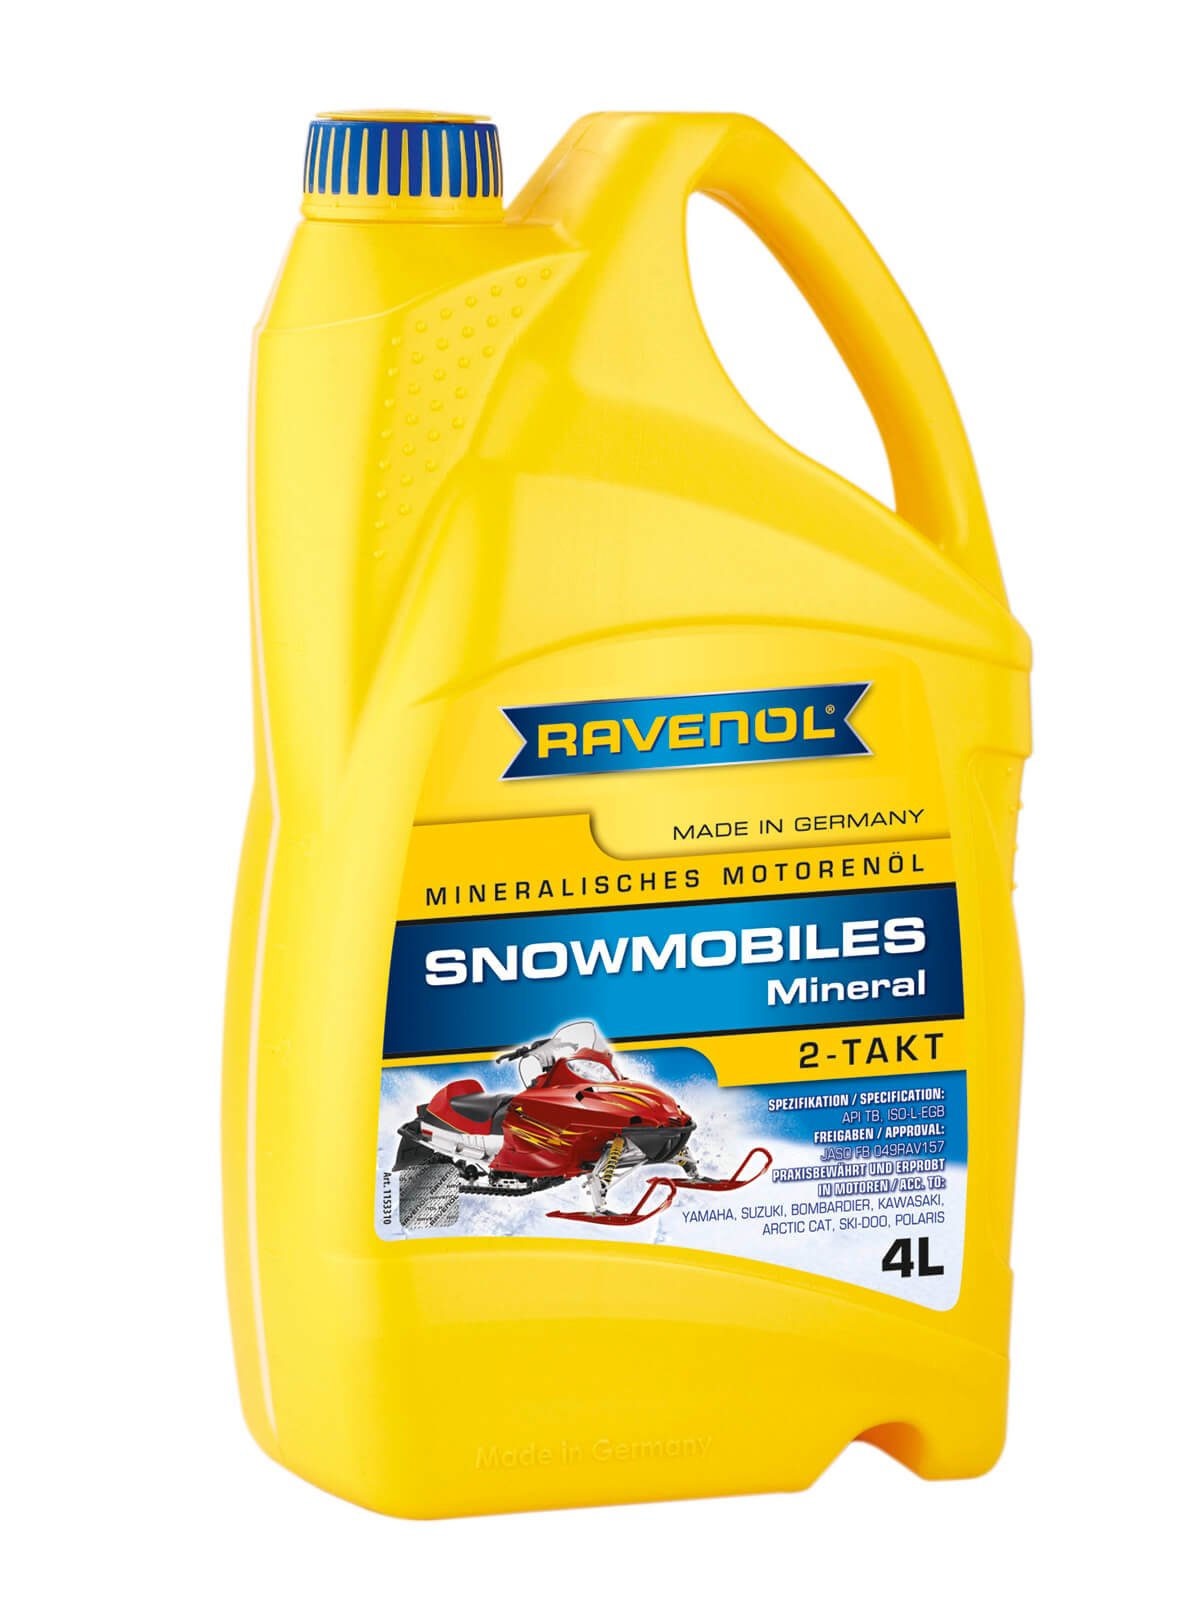 ravenol snowmobiles mineral 2 takt direkt im ravenol shop. Black Bedroom Furniture Sets. Home Design Ideas